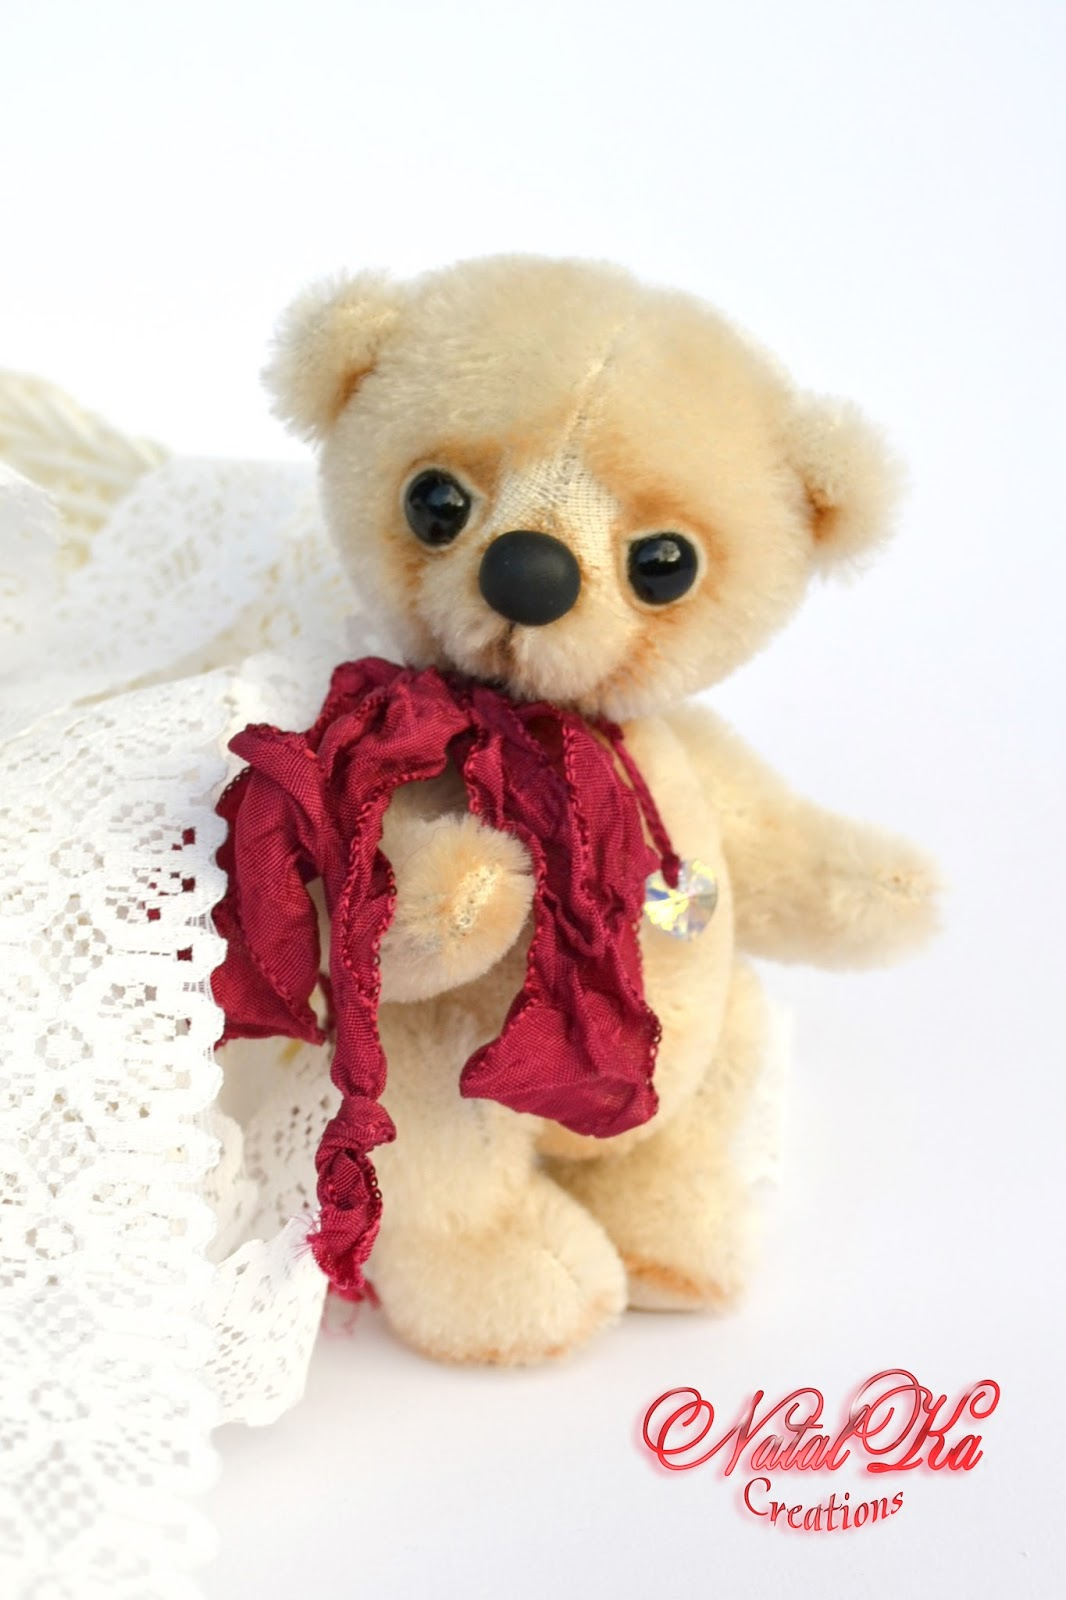 Artist teddy bear, artist bear, teddy bear, ooak, artist bear jointed, handmade by NatalKa Creations. Künstlerbär, Künstlerteddy, Teddybär, Teddy, Unikat, handgemacht von NatalKa Creations